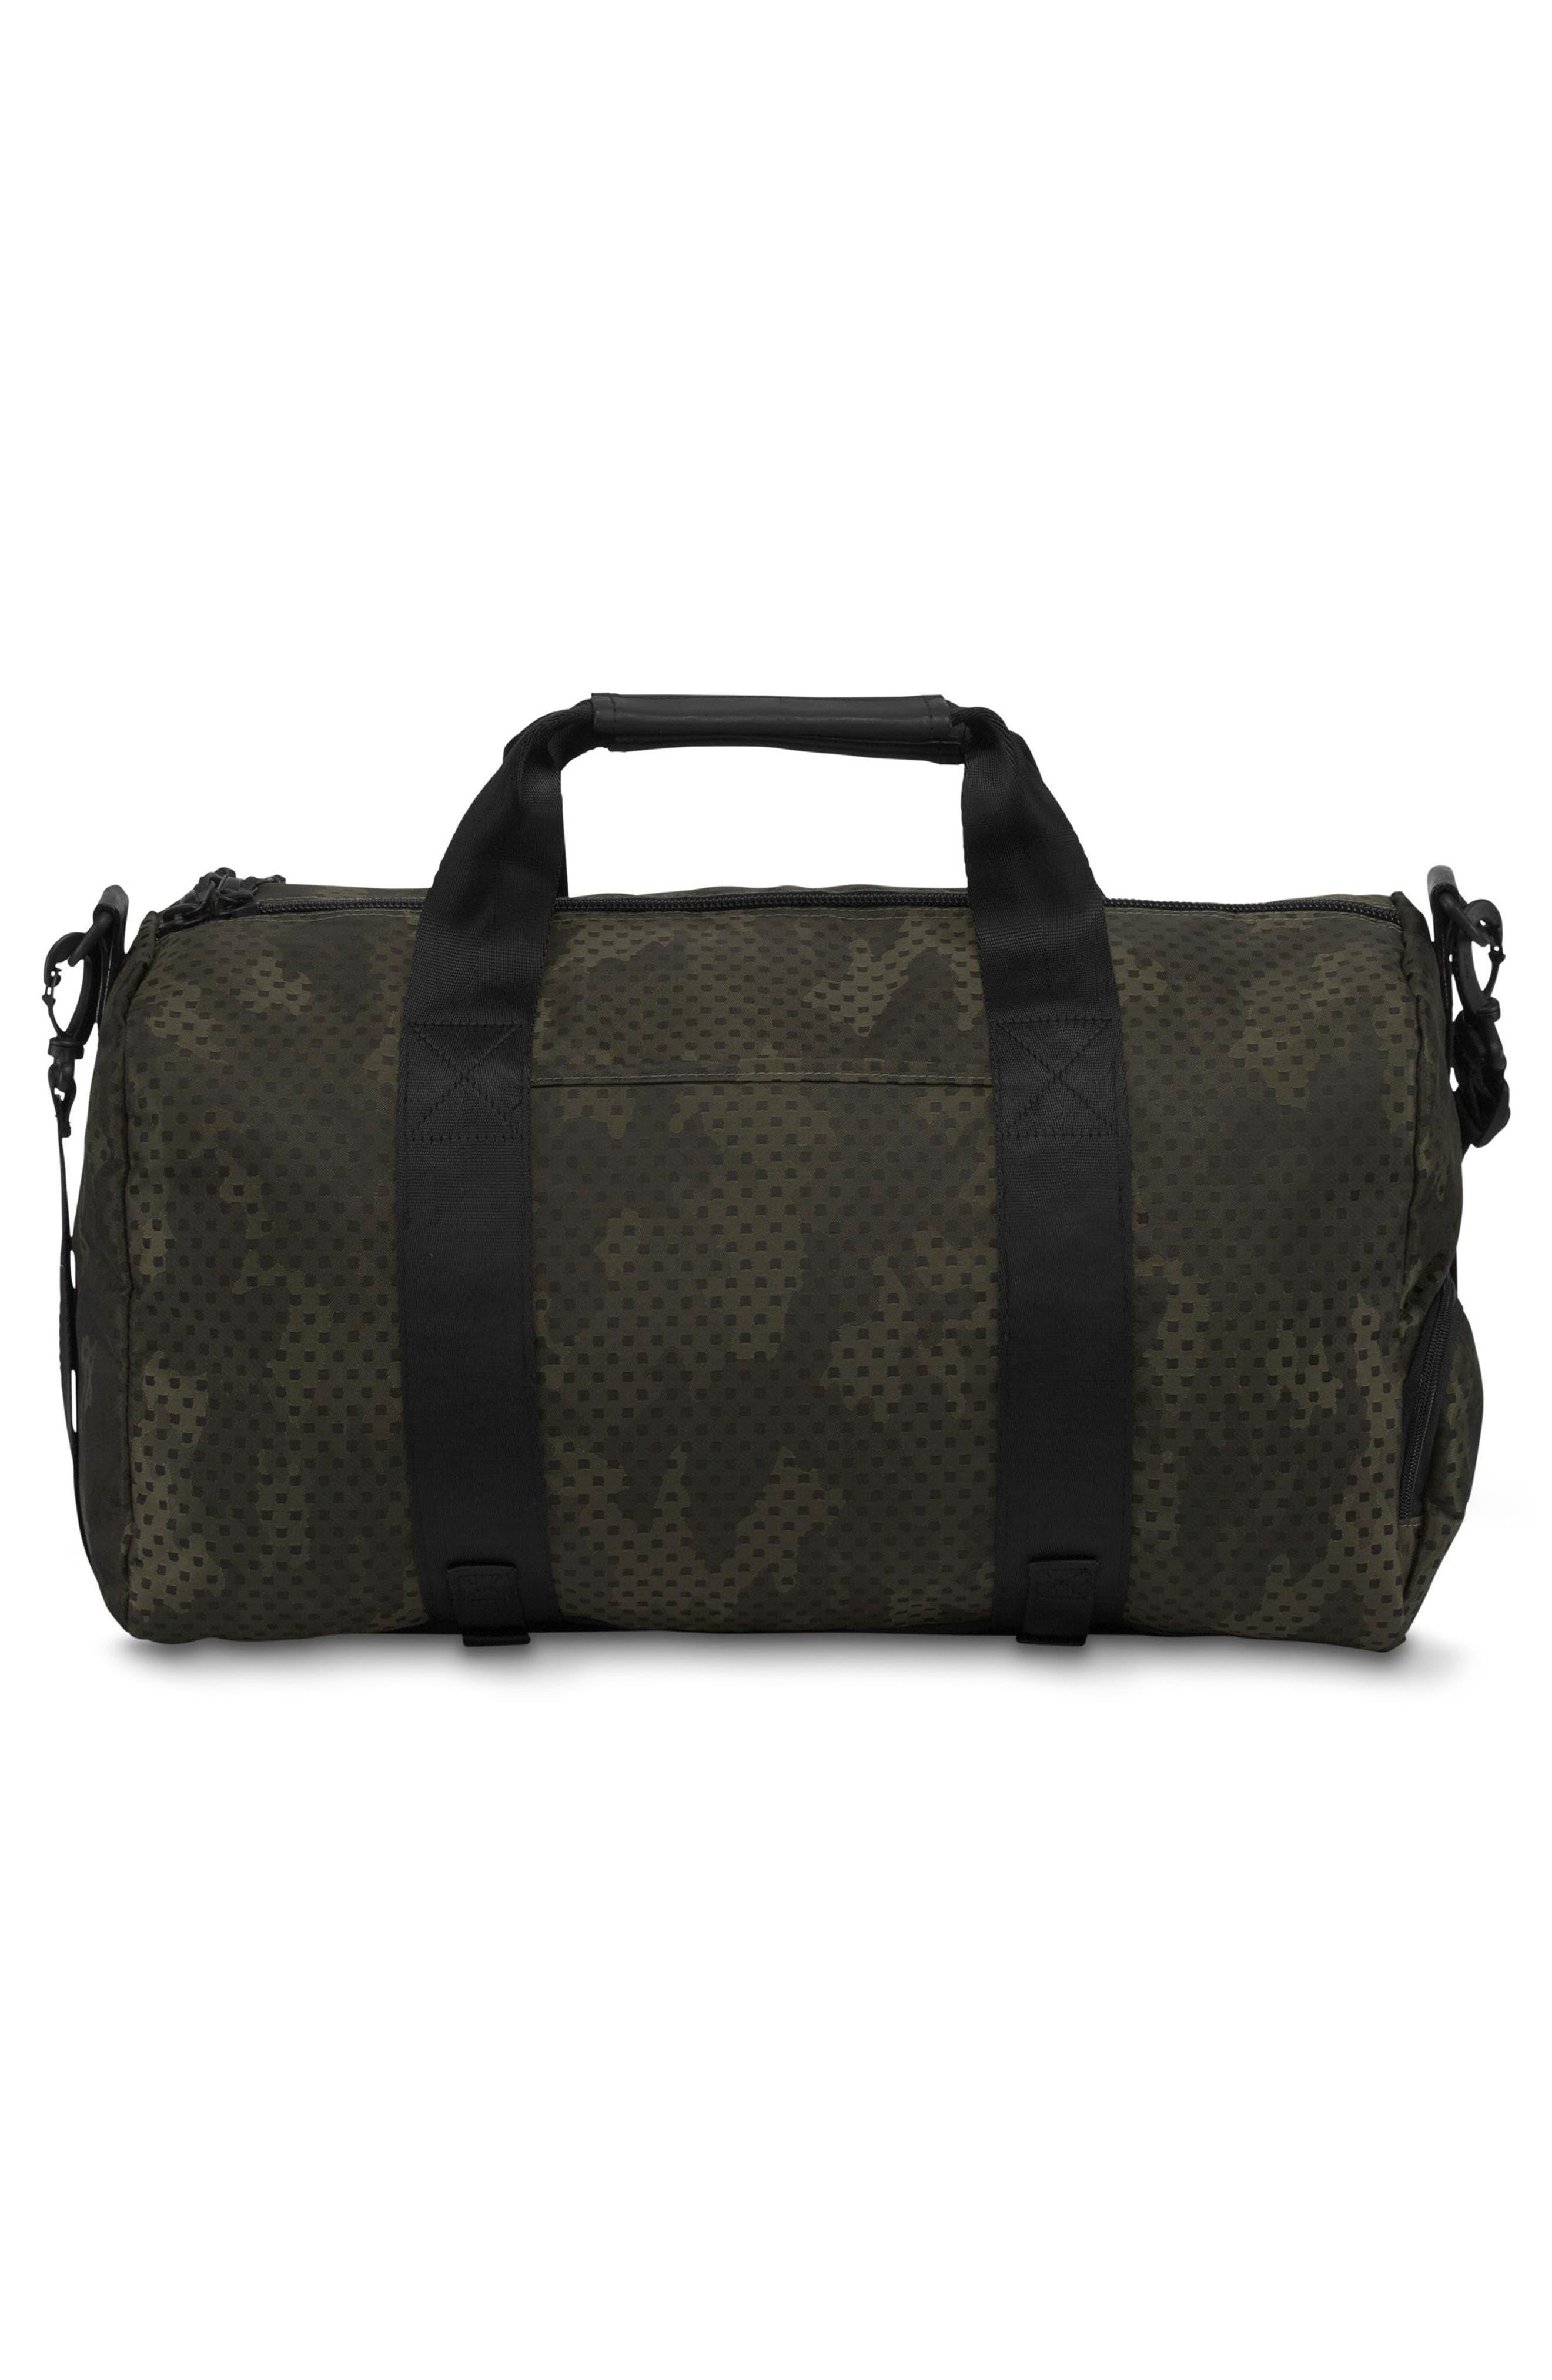 Wayward Duffel Bag,                             Alternate thumbnail 3, color,                             Green Square Camo